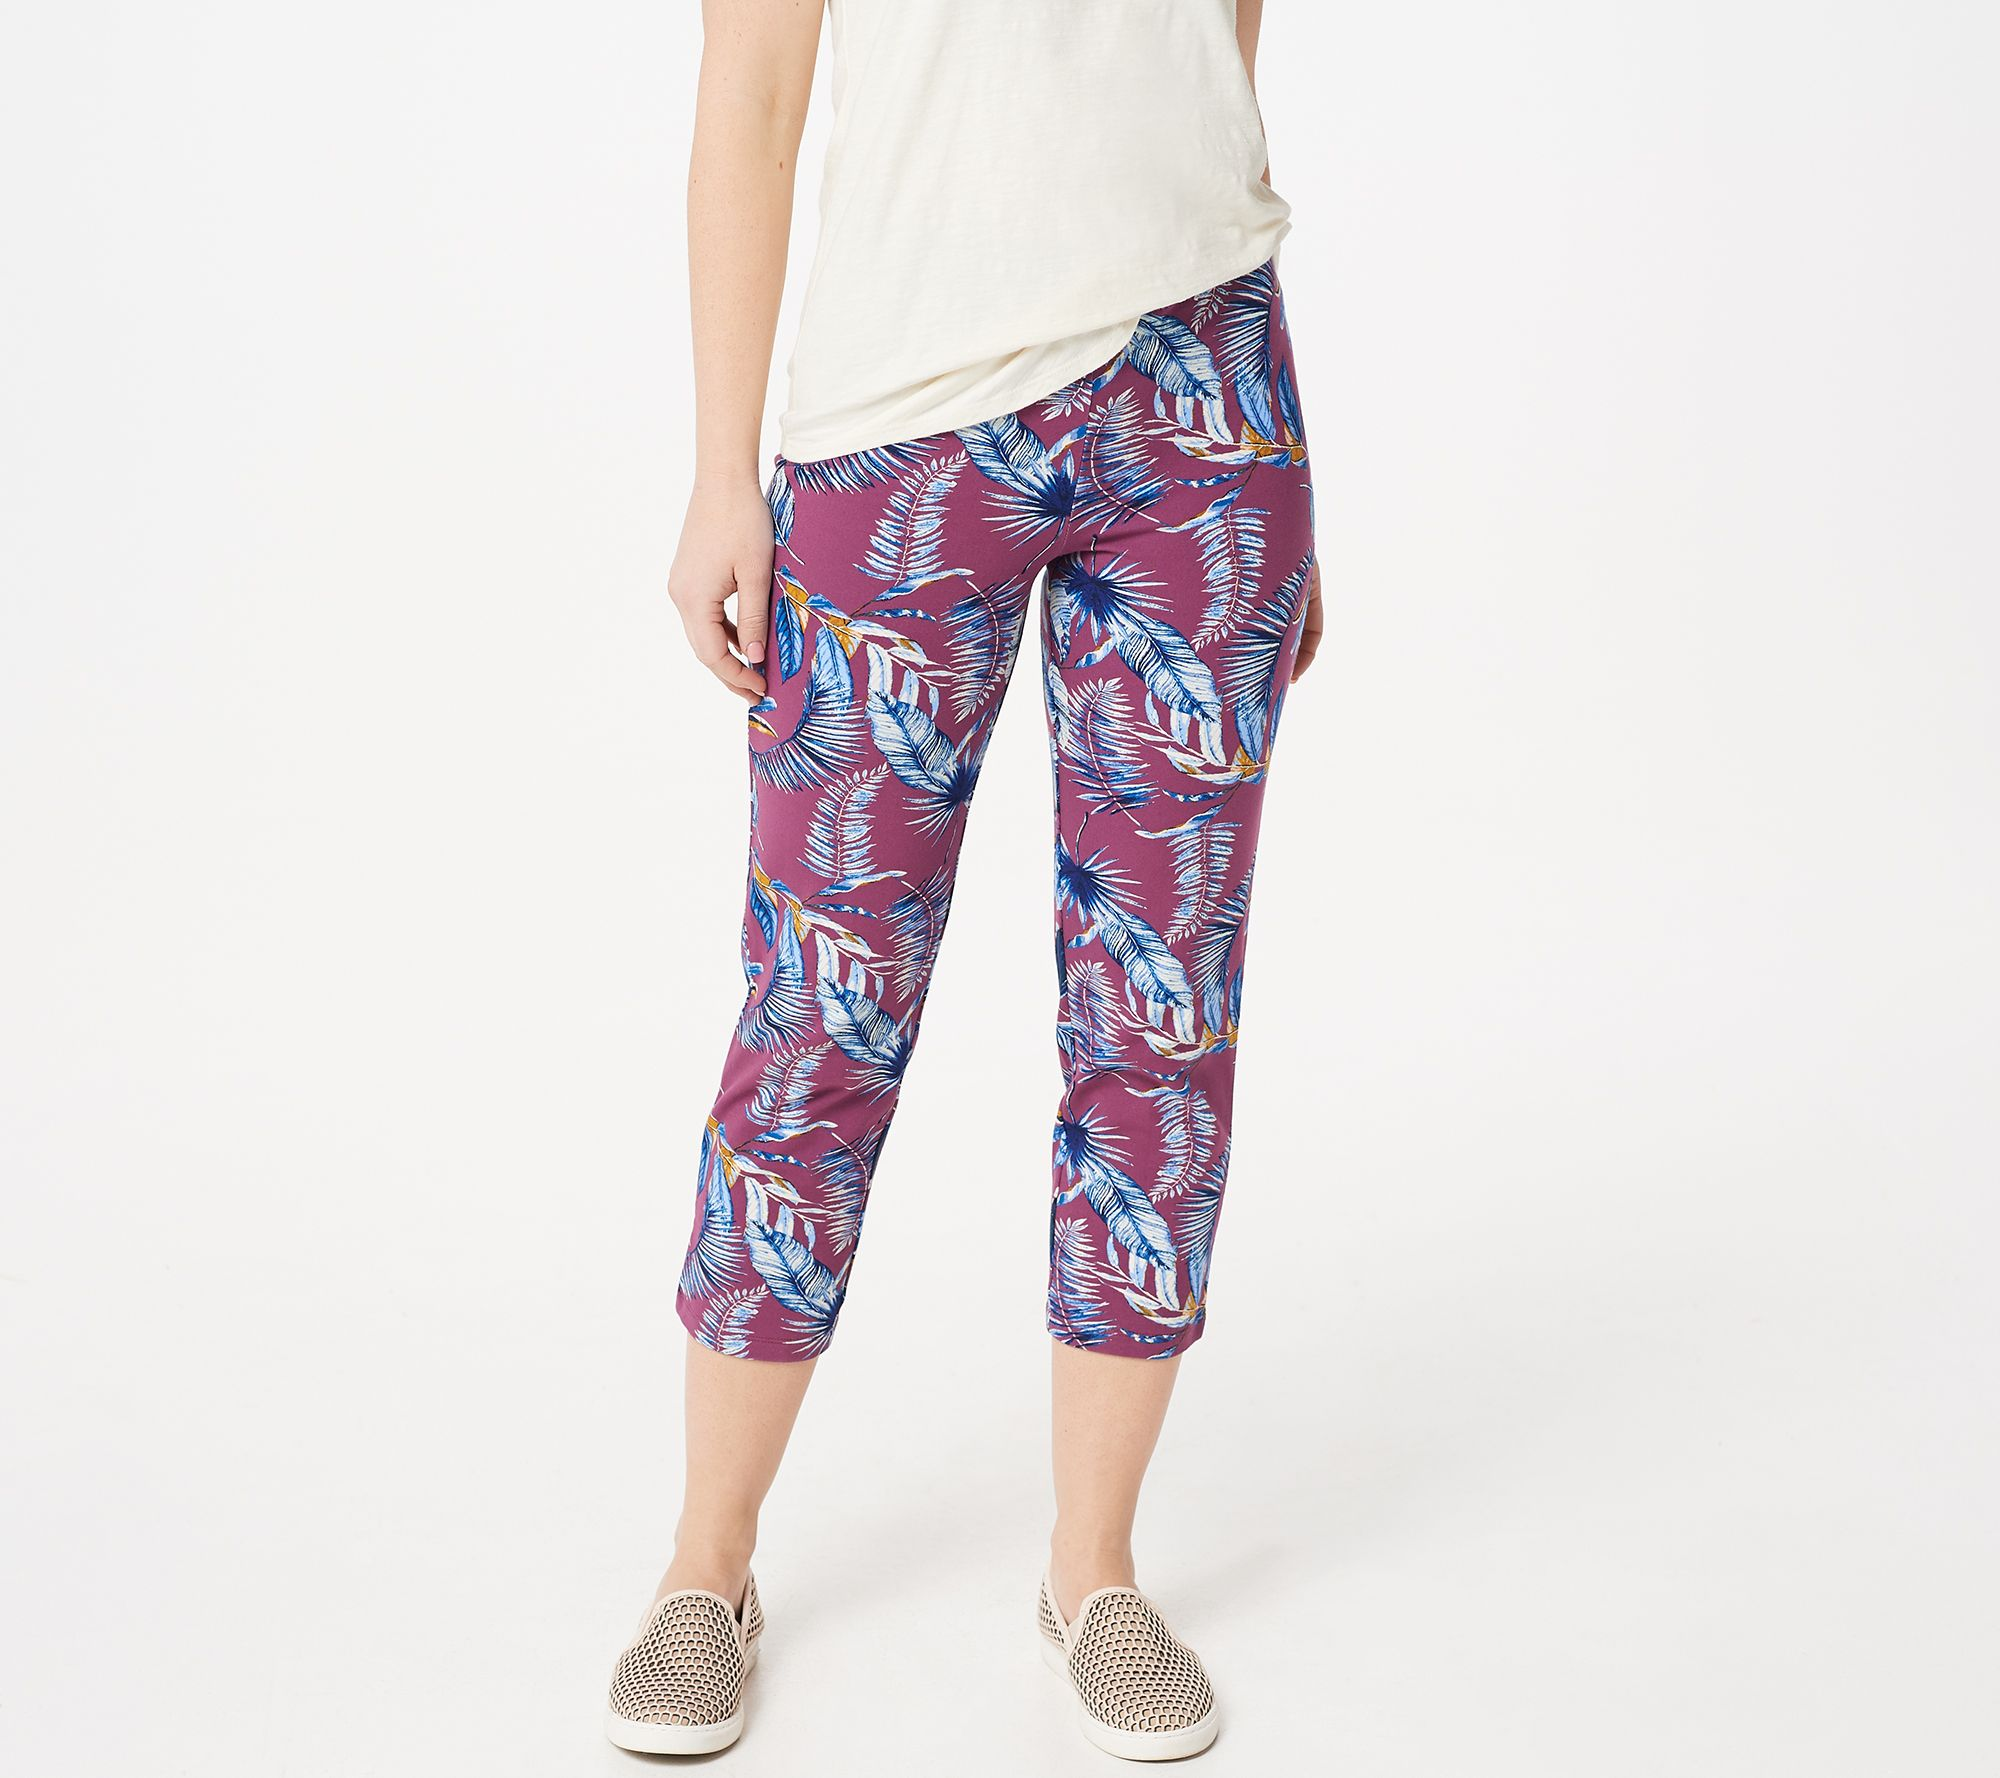 03733b6b96bb2 Women with Control Regular Pull-On Printed Crop Pants - Page 1 — QVC.com